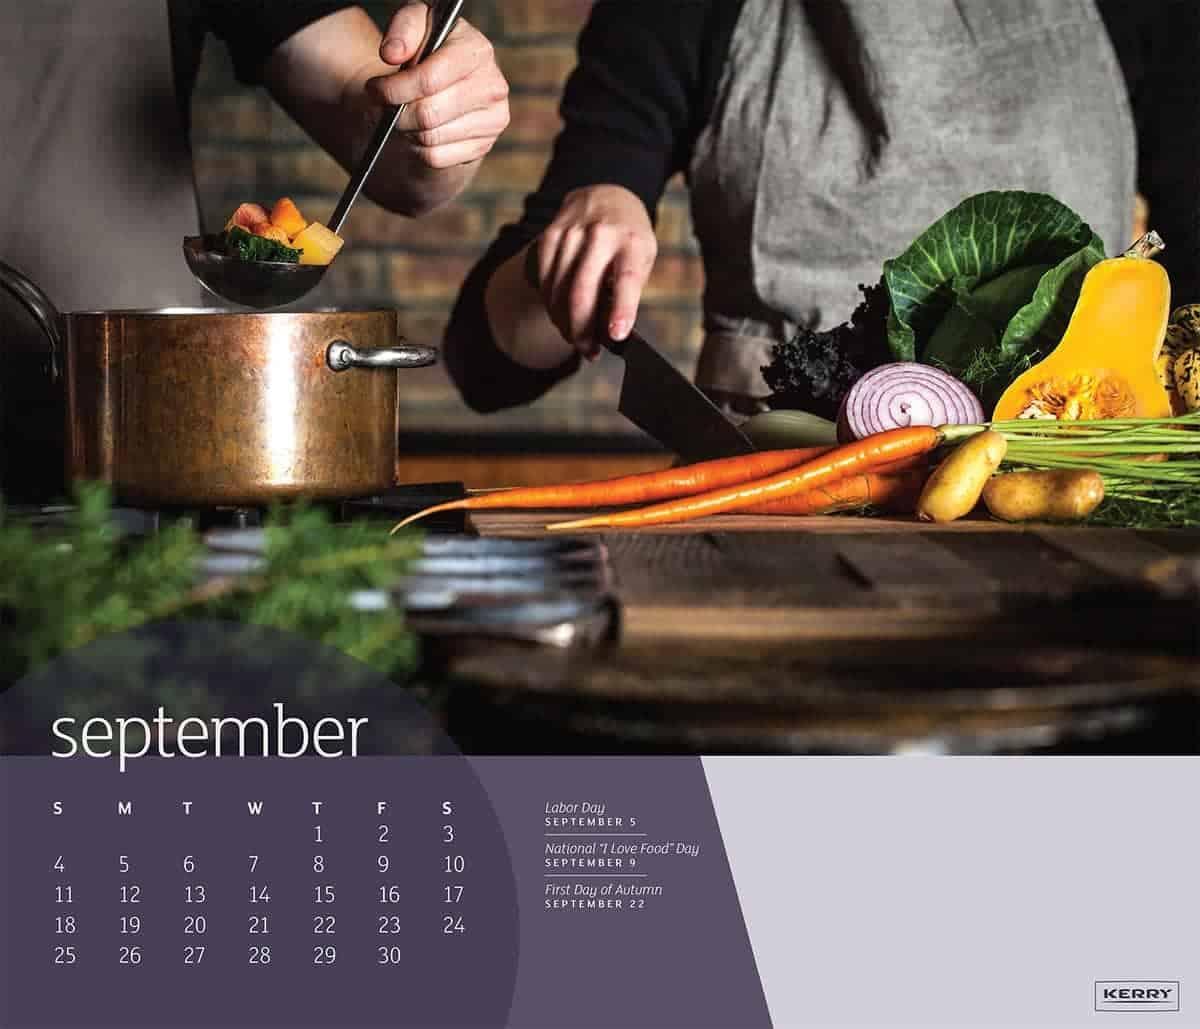 2016 Kerry Holiday Calendar_Jena Carlin Photography_96-11